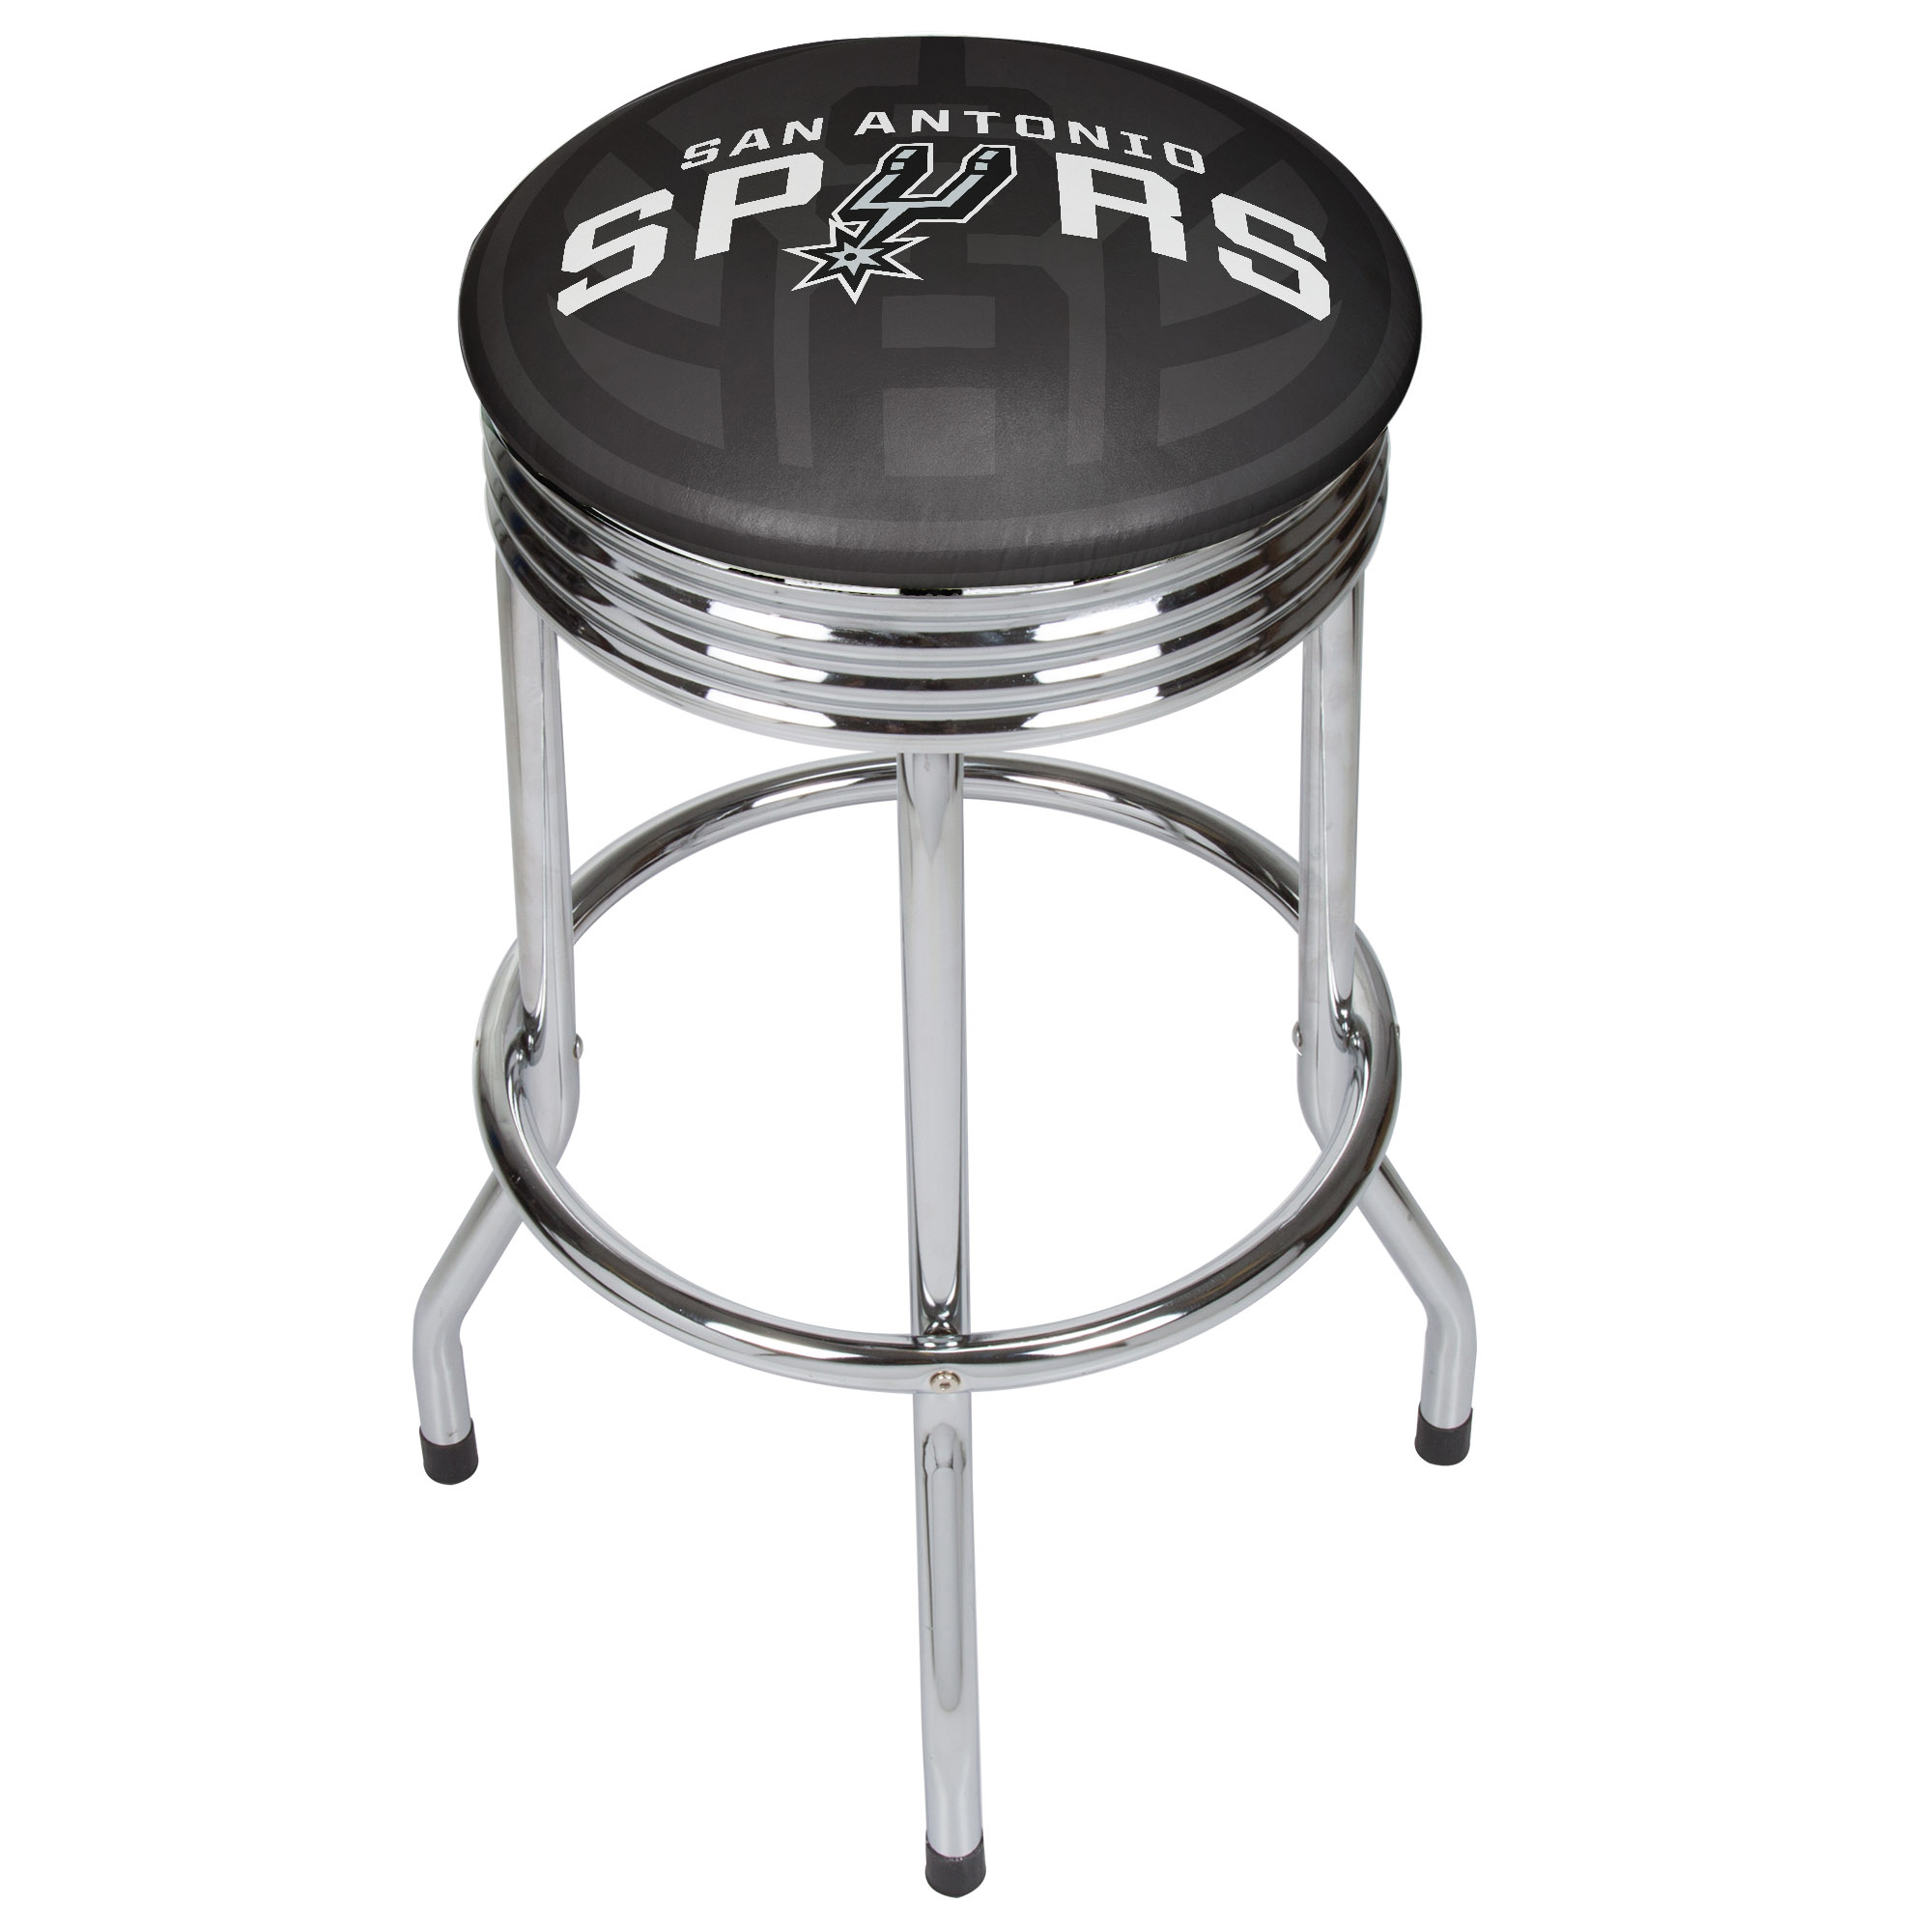 NBA Chrome Ribbed Bar Stool - Fade - San Antonio Spurs